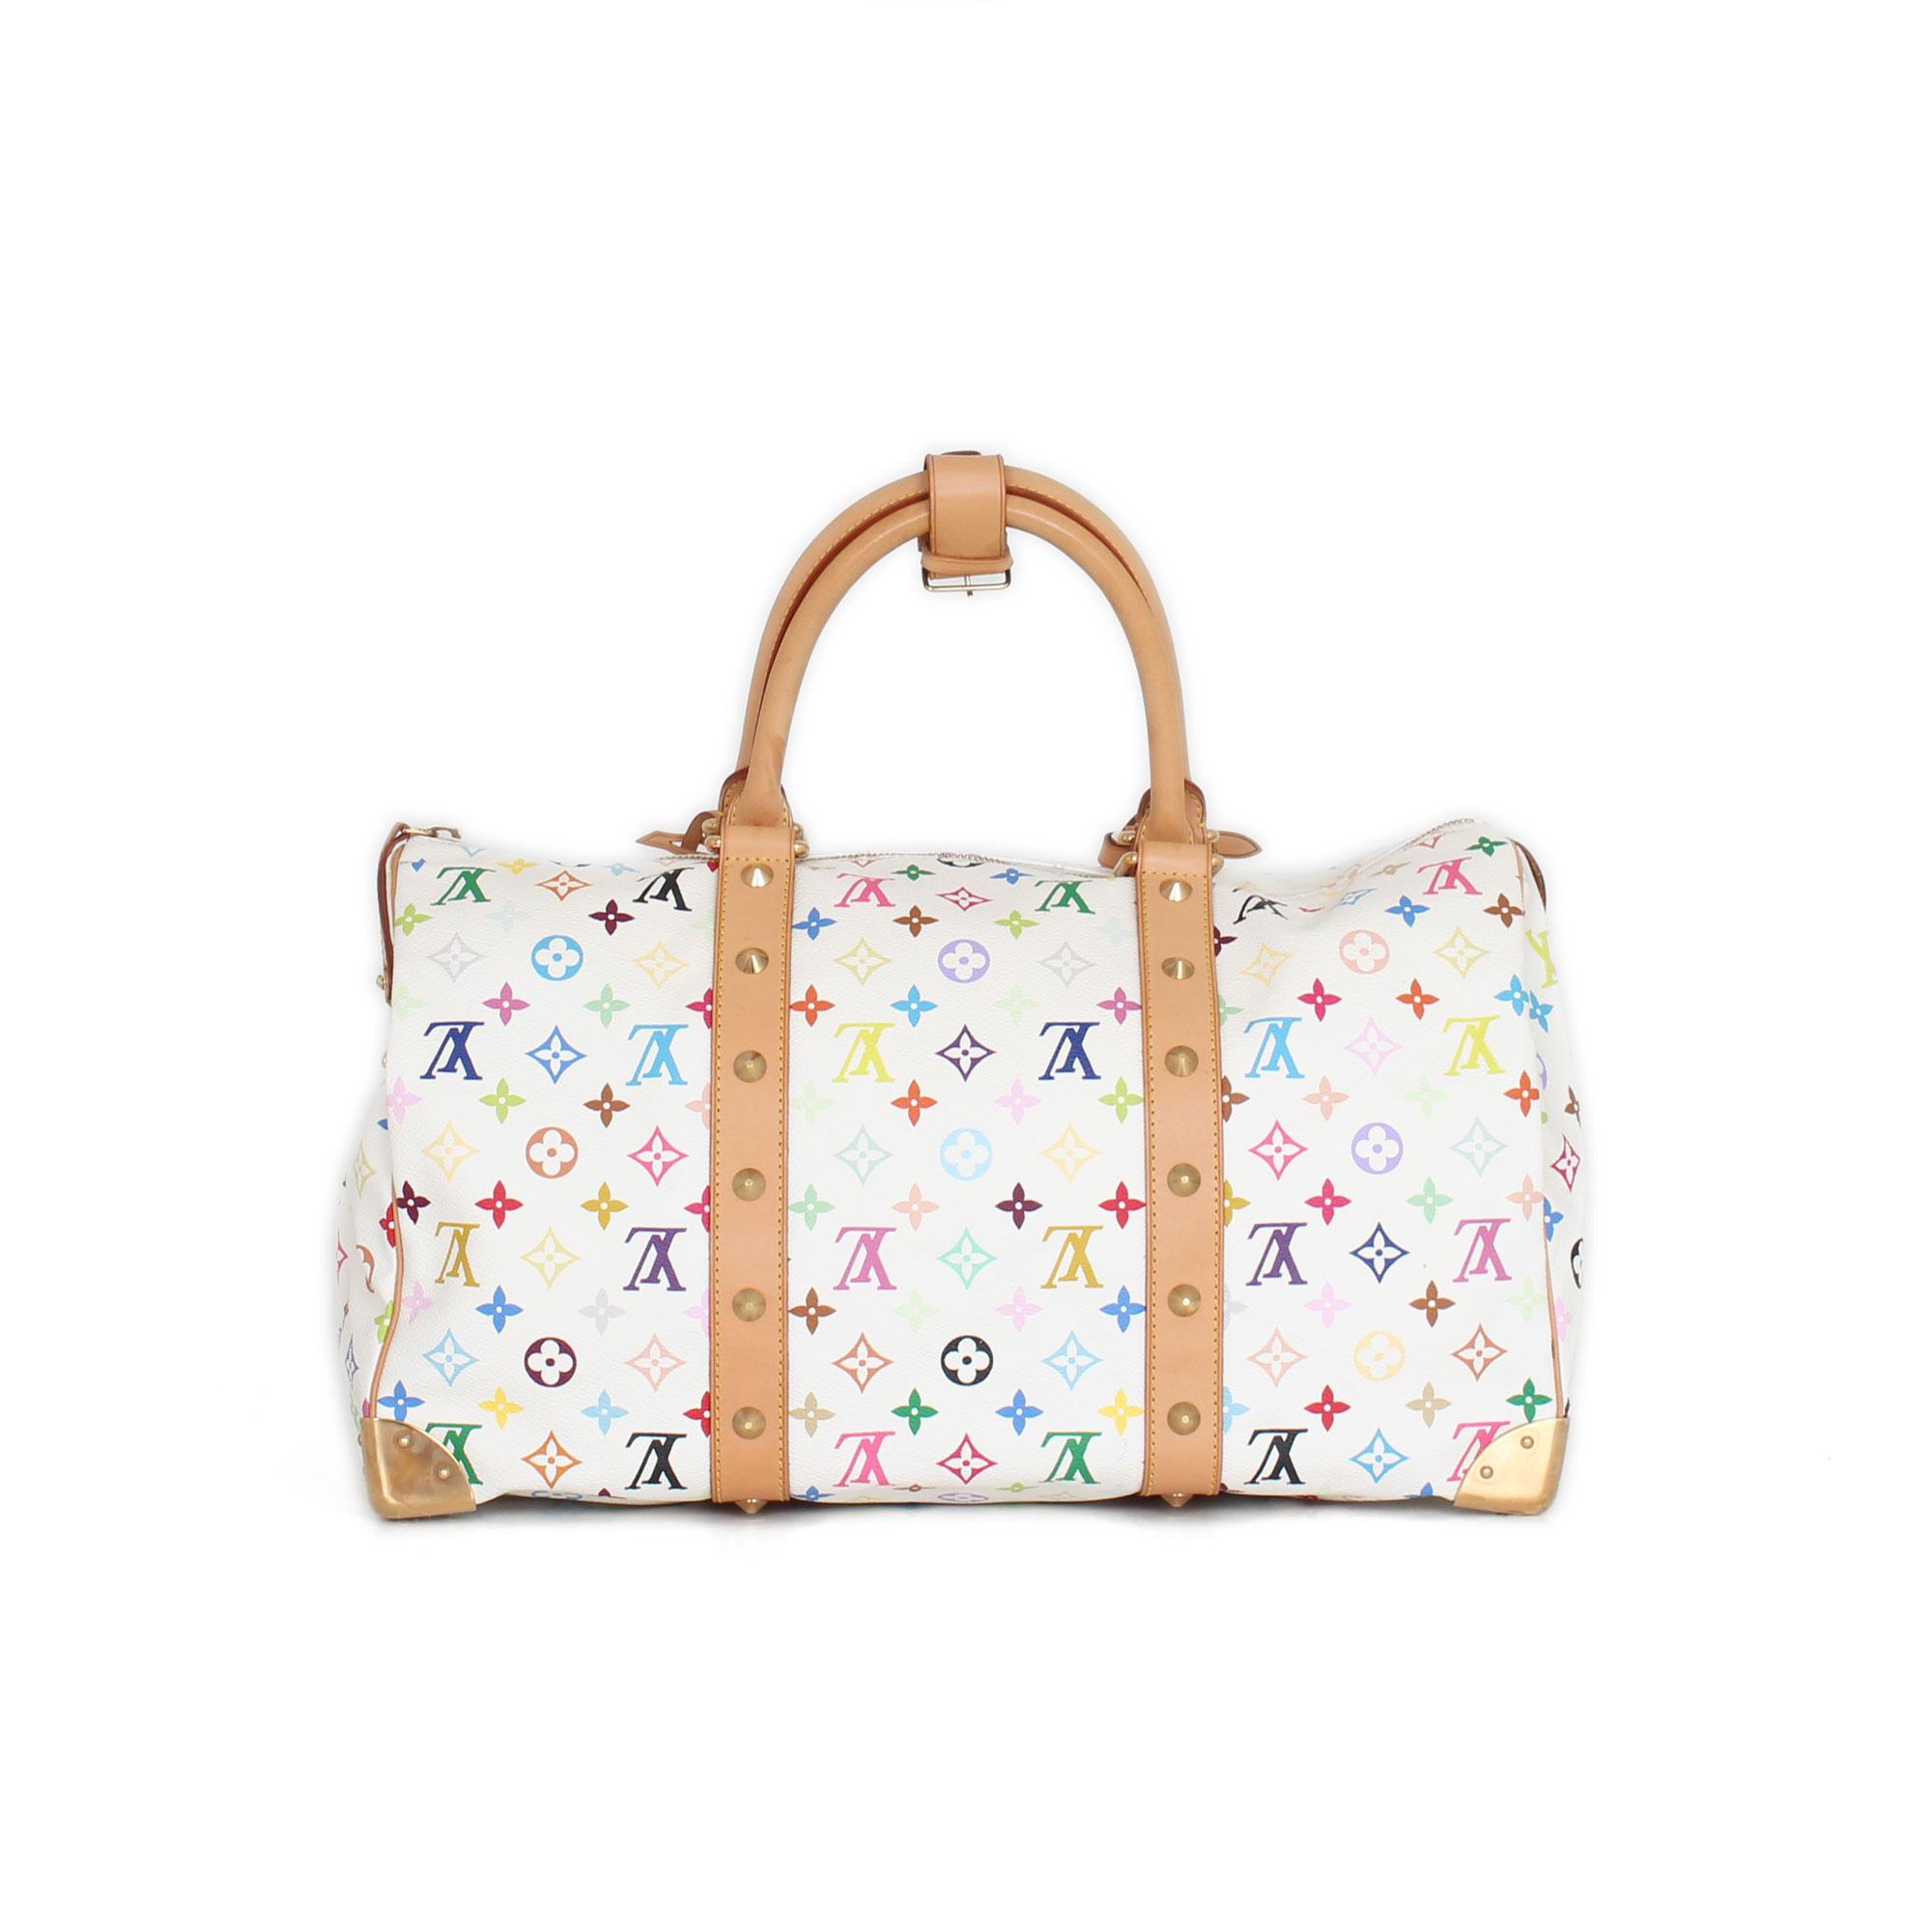 b5c74256bee Luxury bag sale | Louis Vuitton Bag Keepall Murakami | CBL Bags